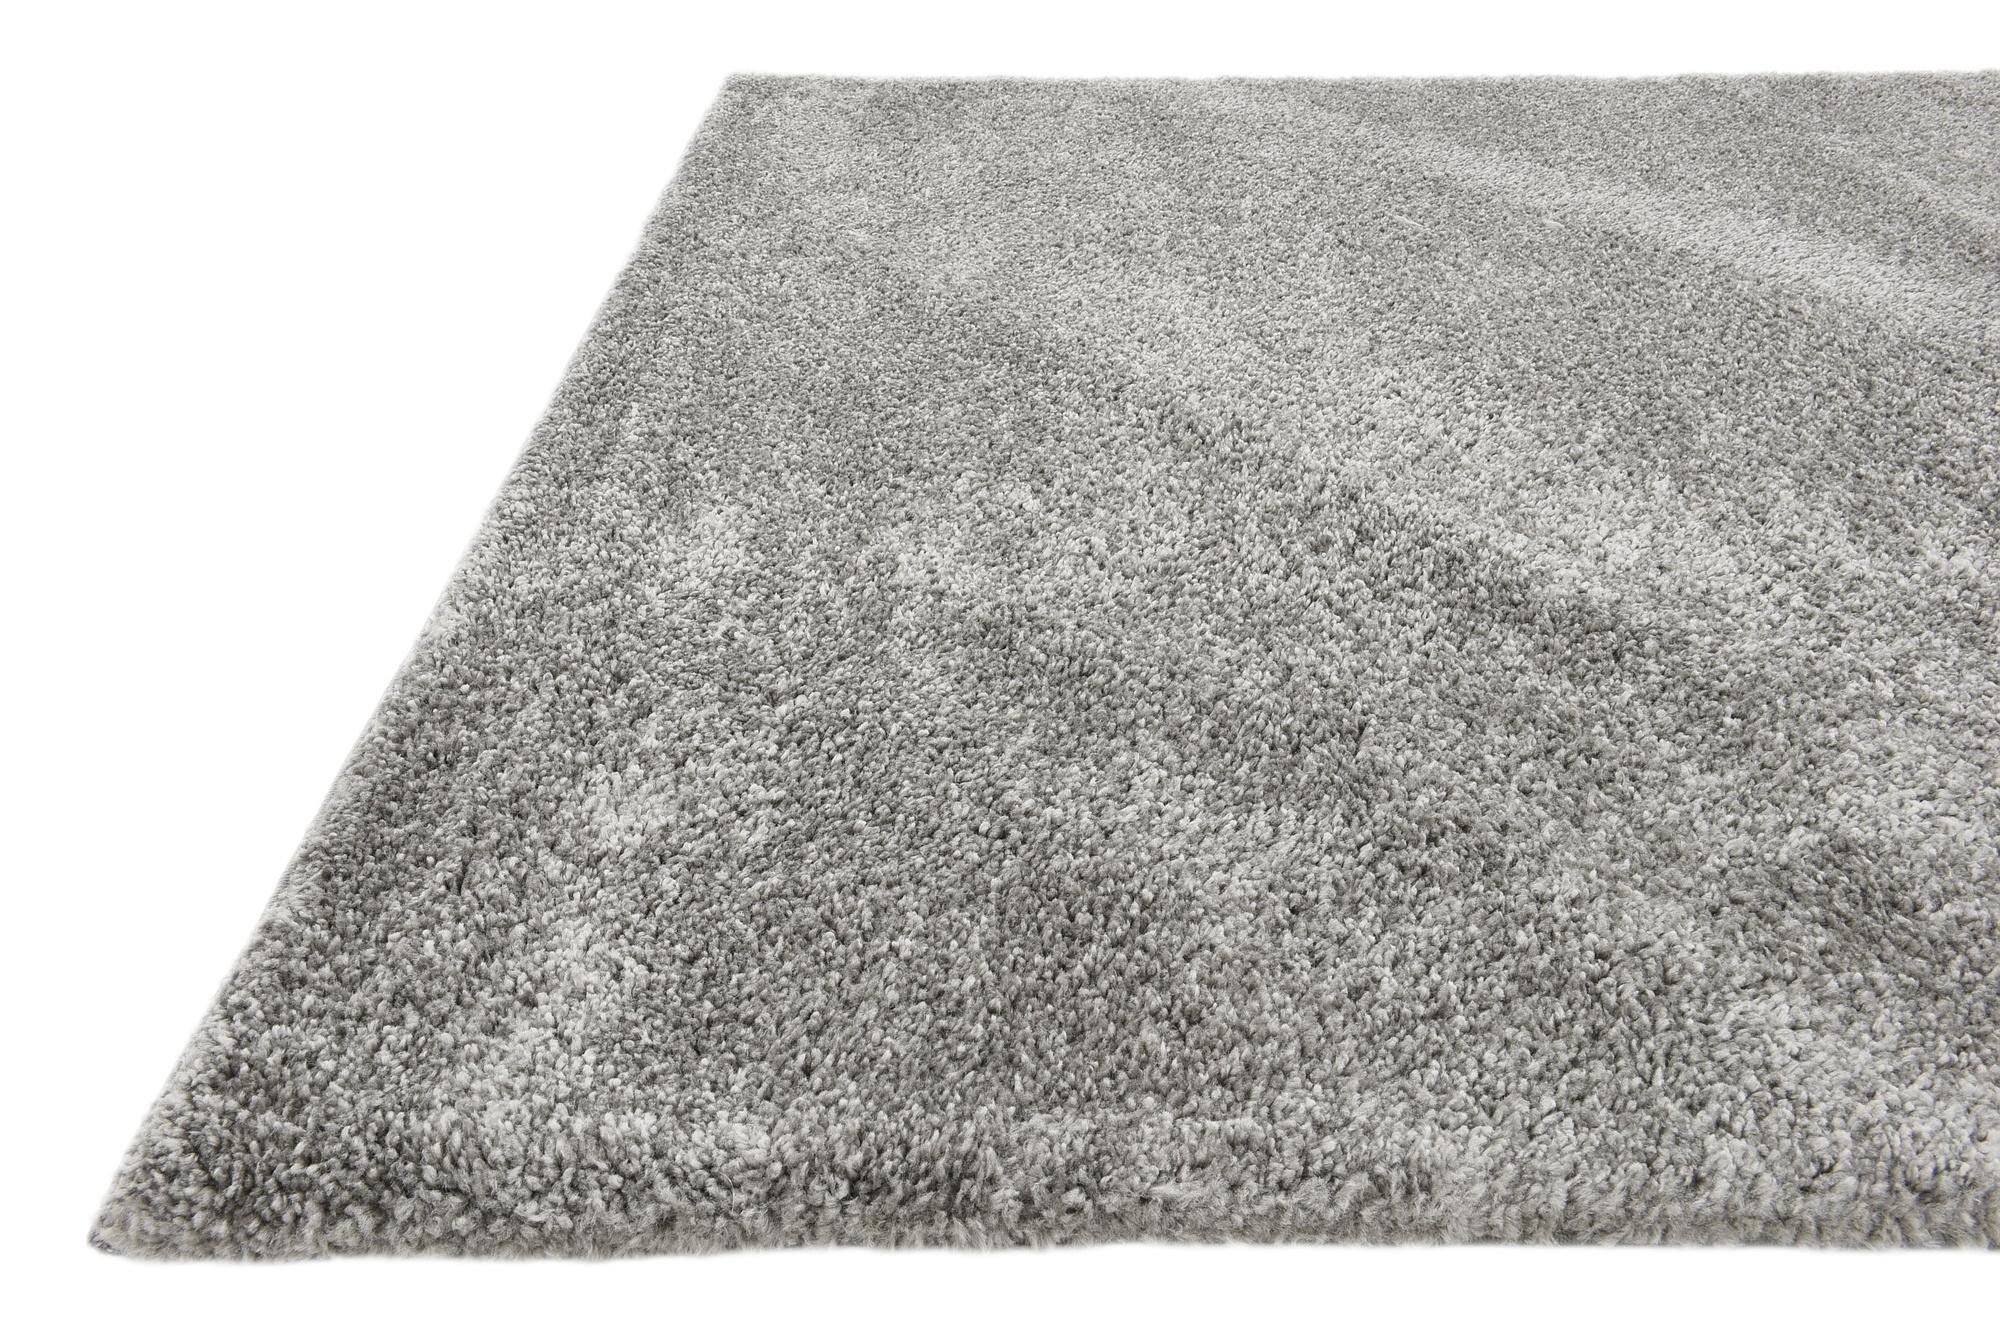 Shaggy Contemporary Area Rug Soft Thick Small Modern Plain